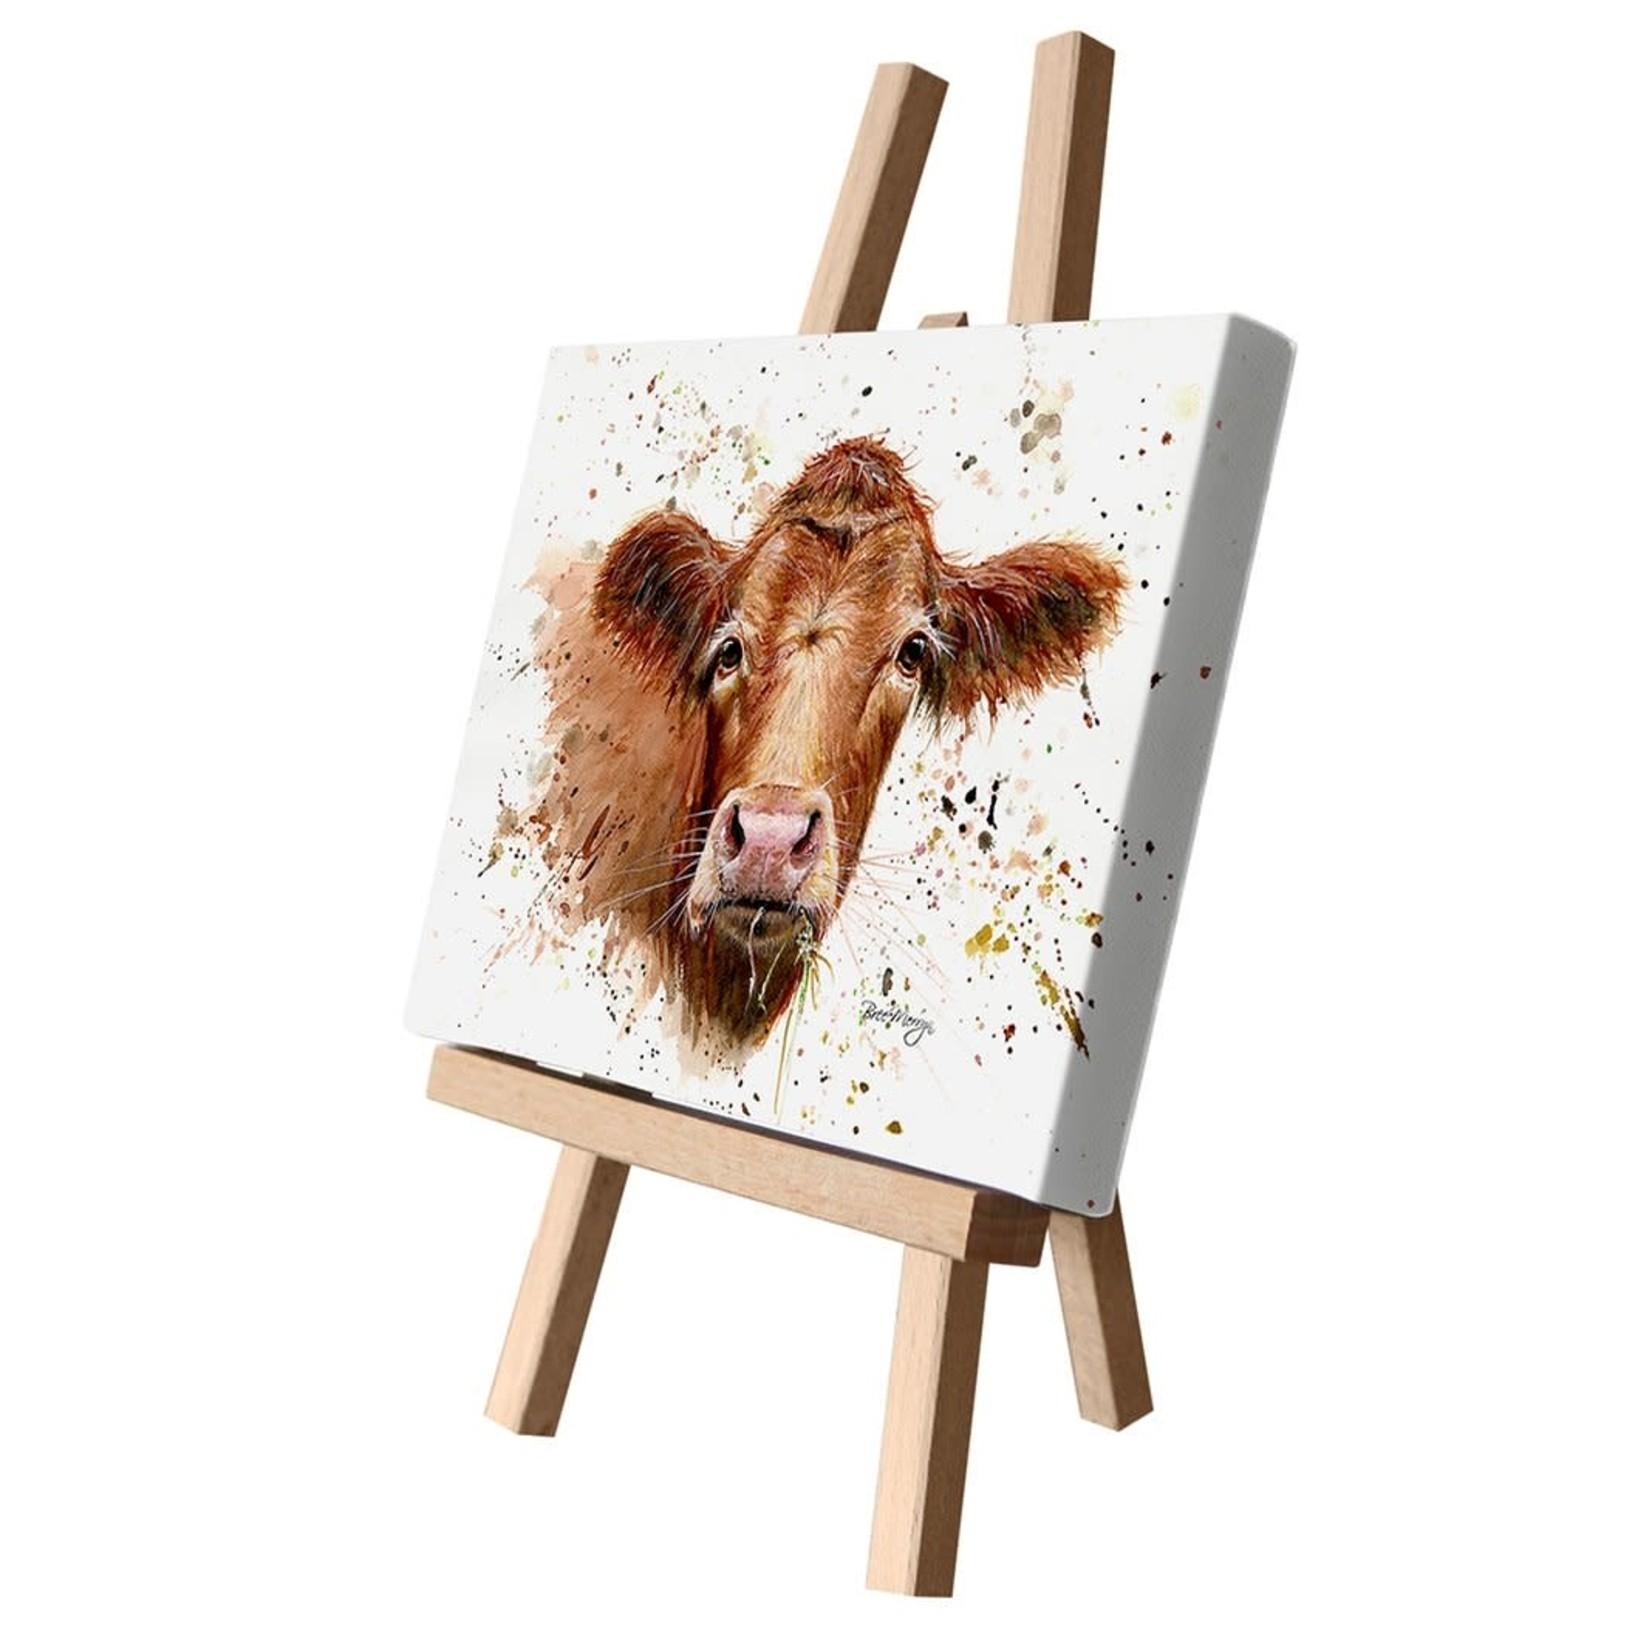 Bree Merryn Gertrude Canvas Cutie 15 x 20 - Cow